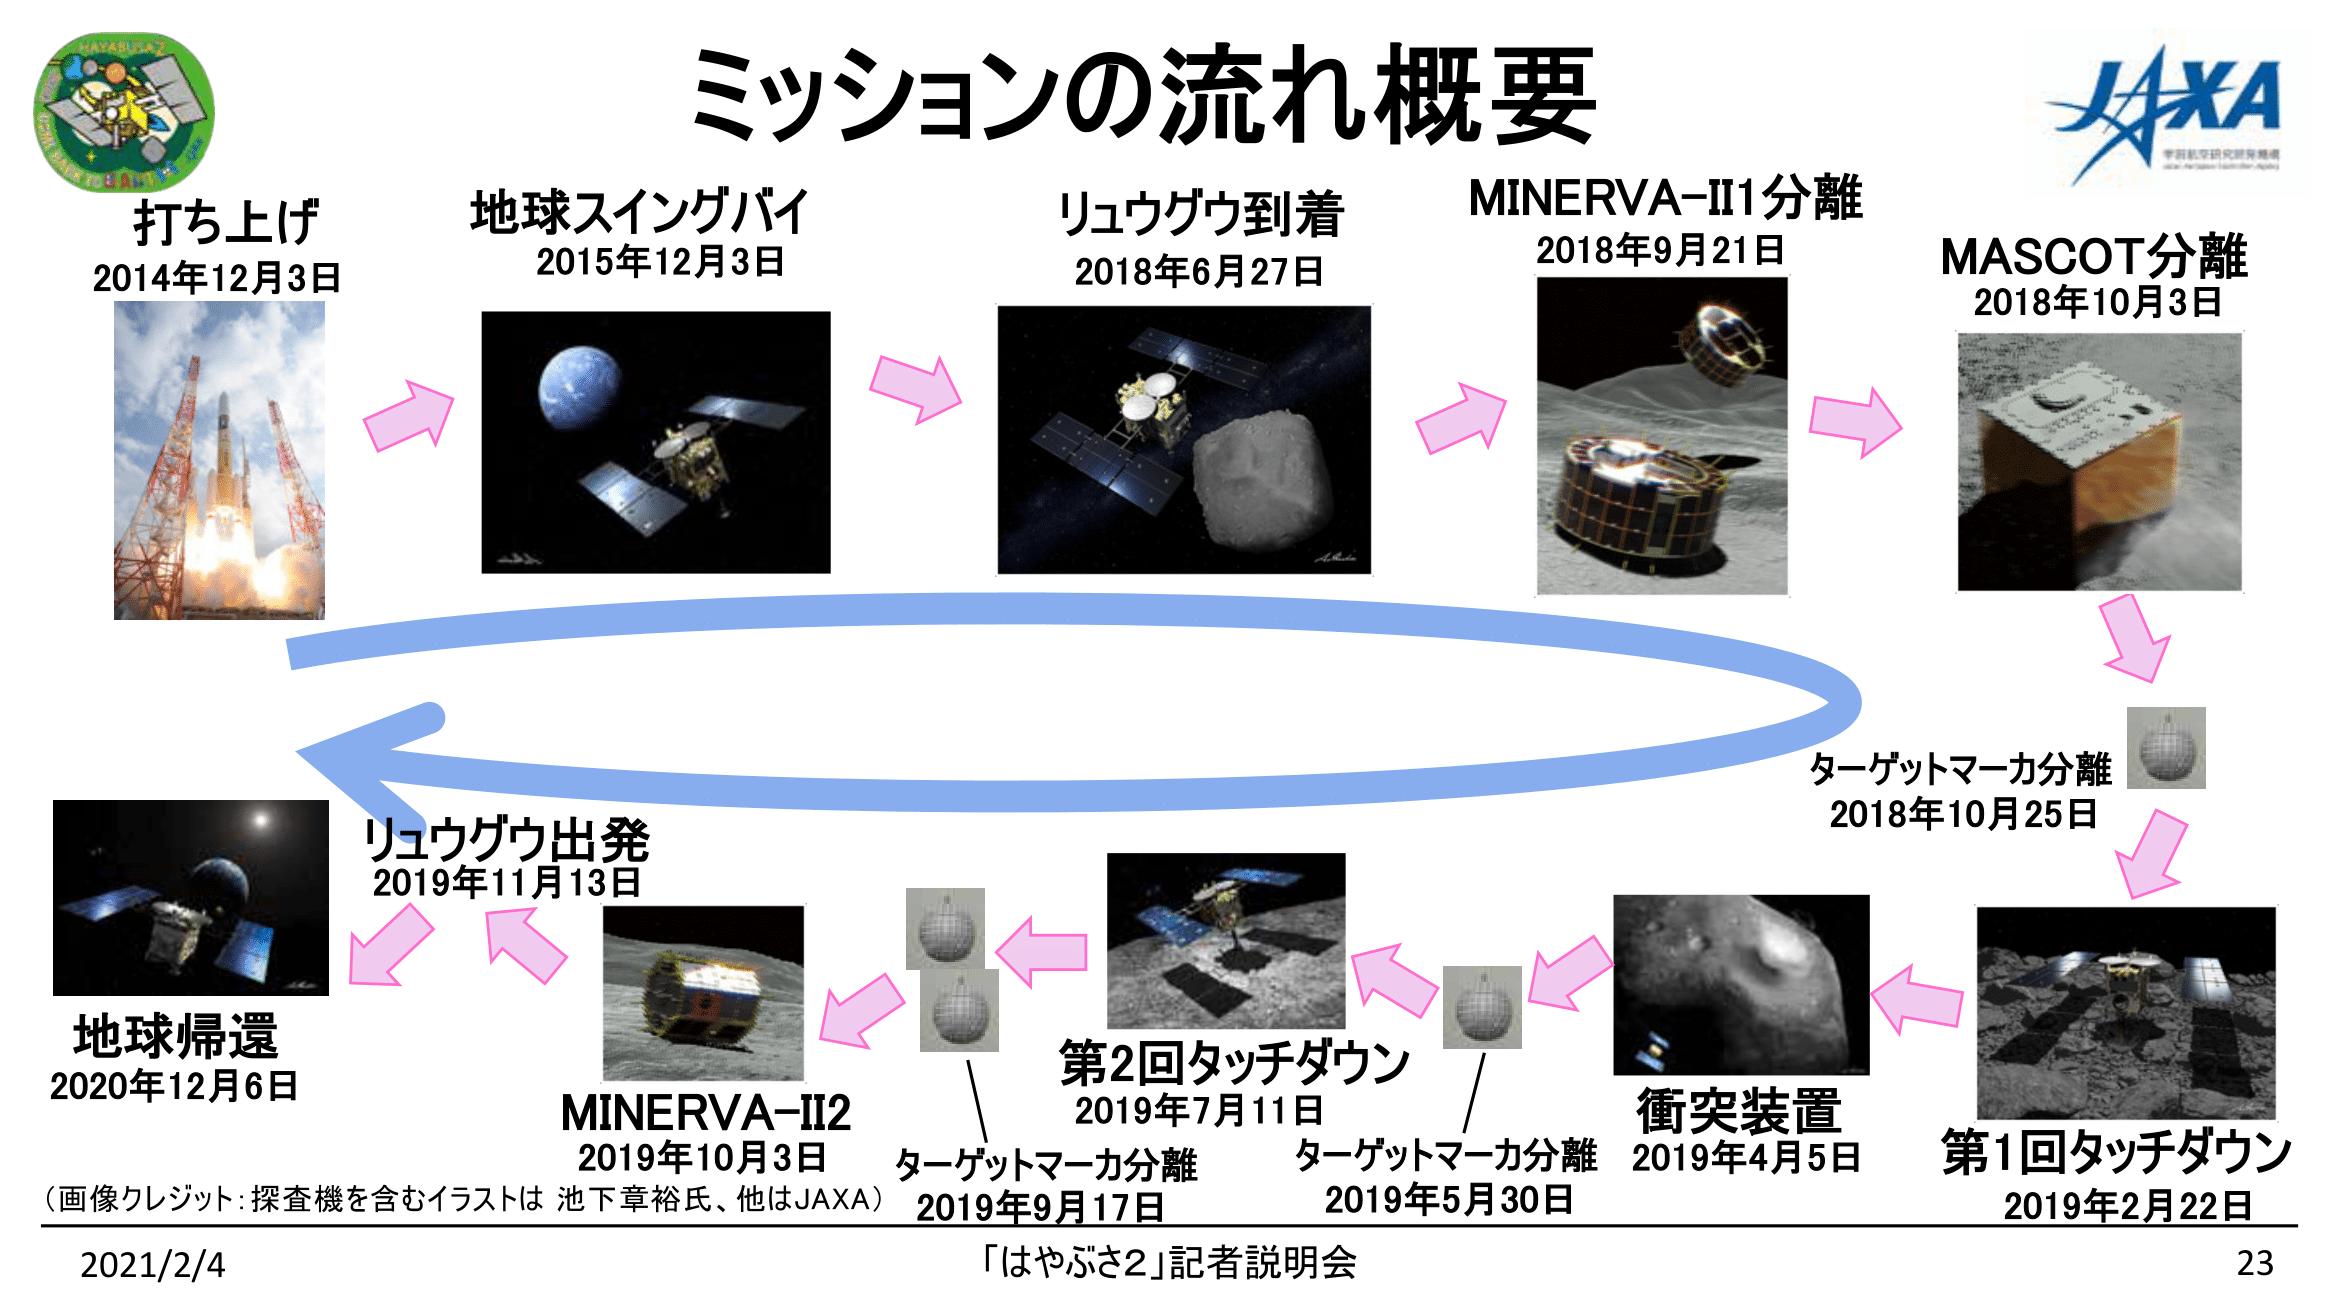 f:id:Imamura:20210204134509p:plain